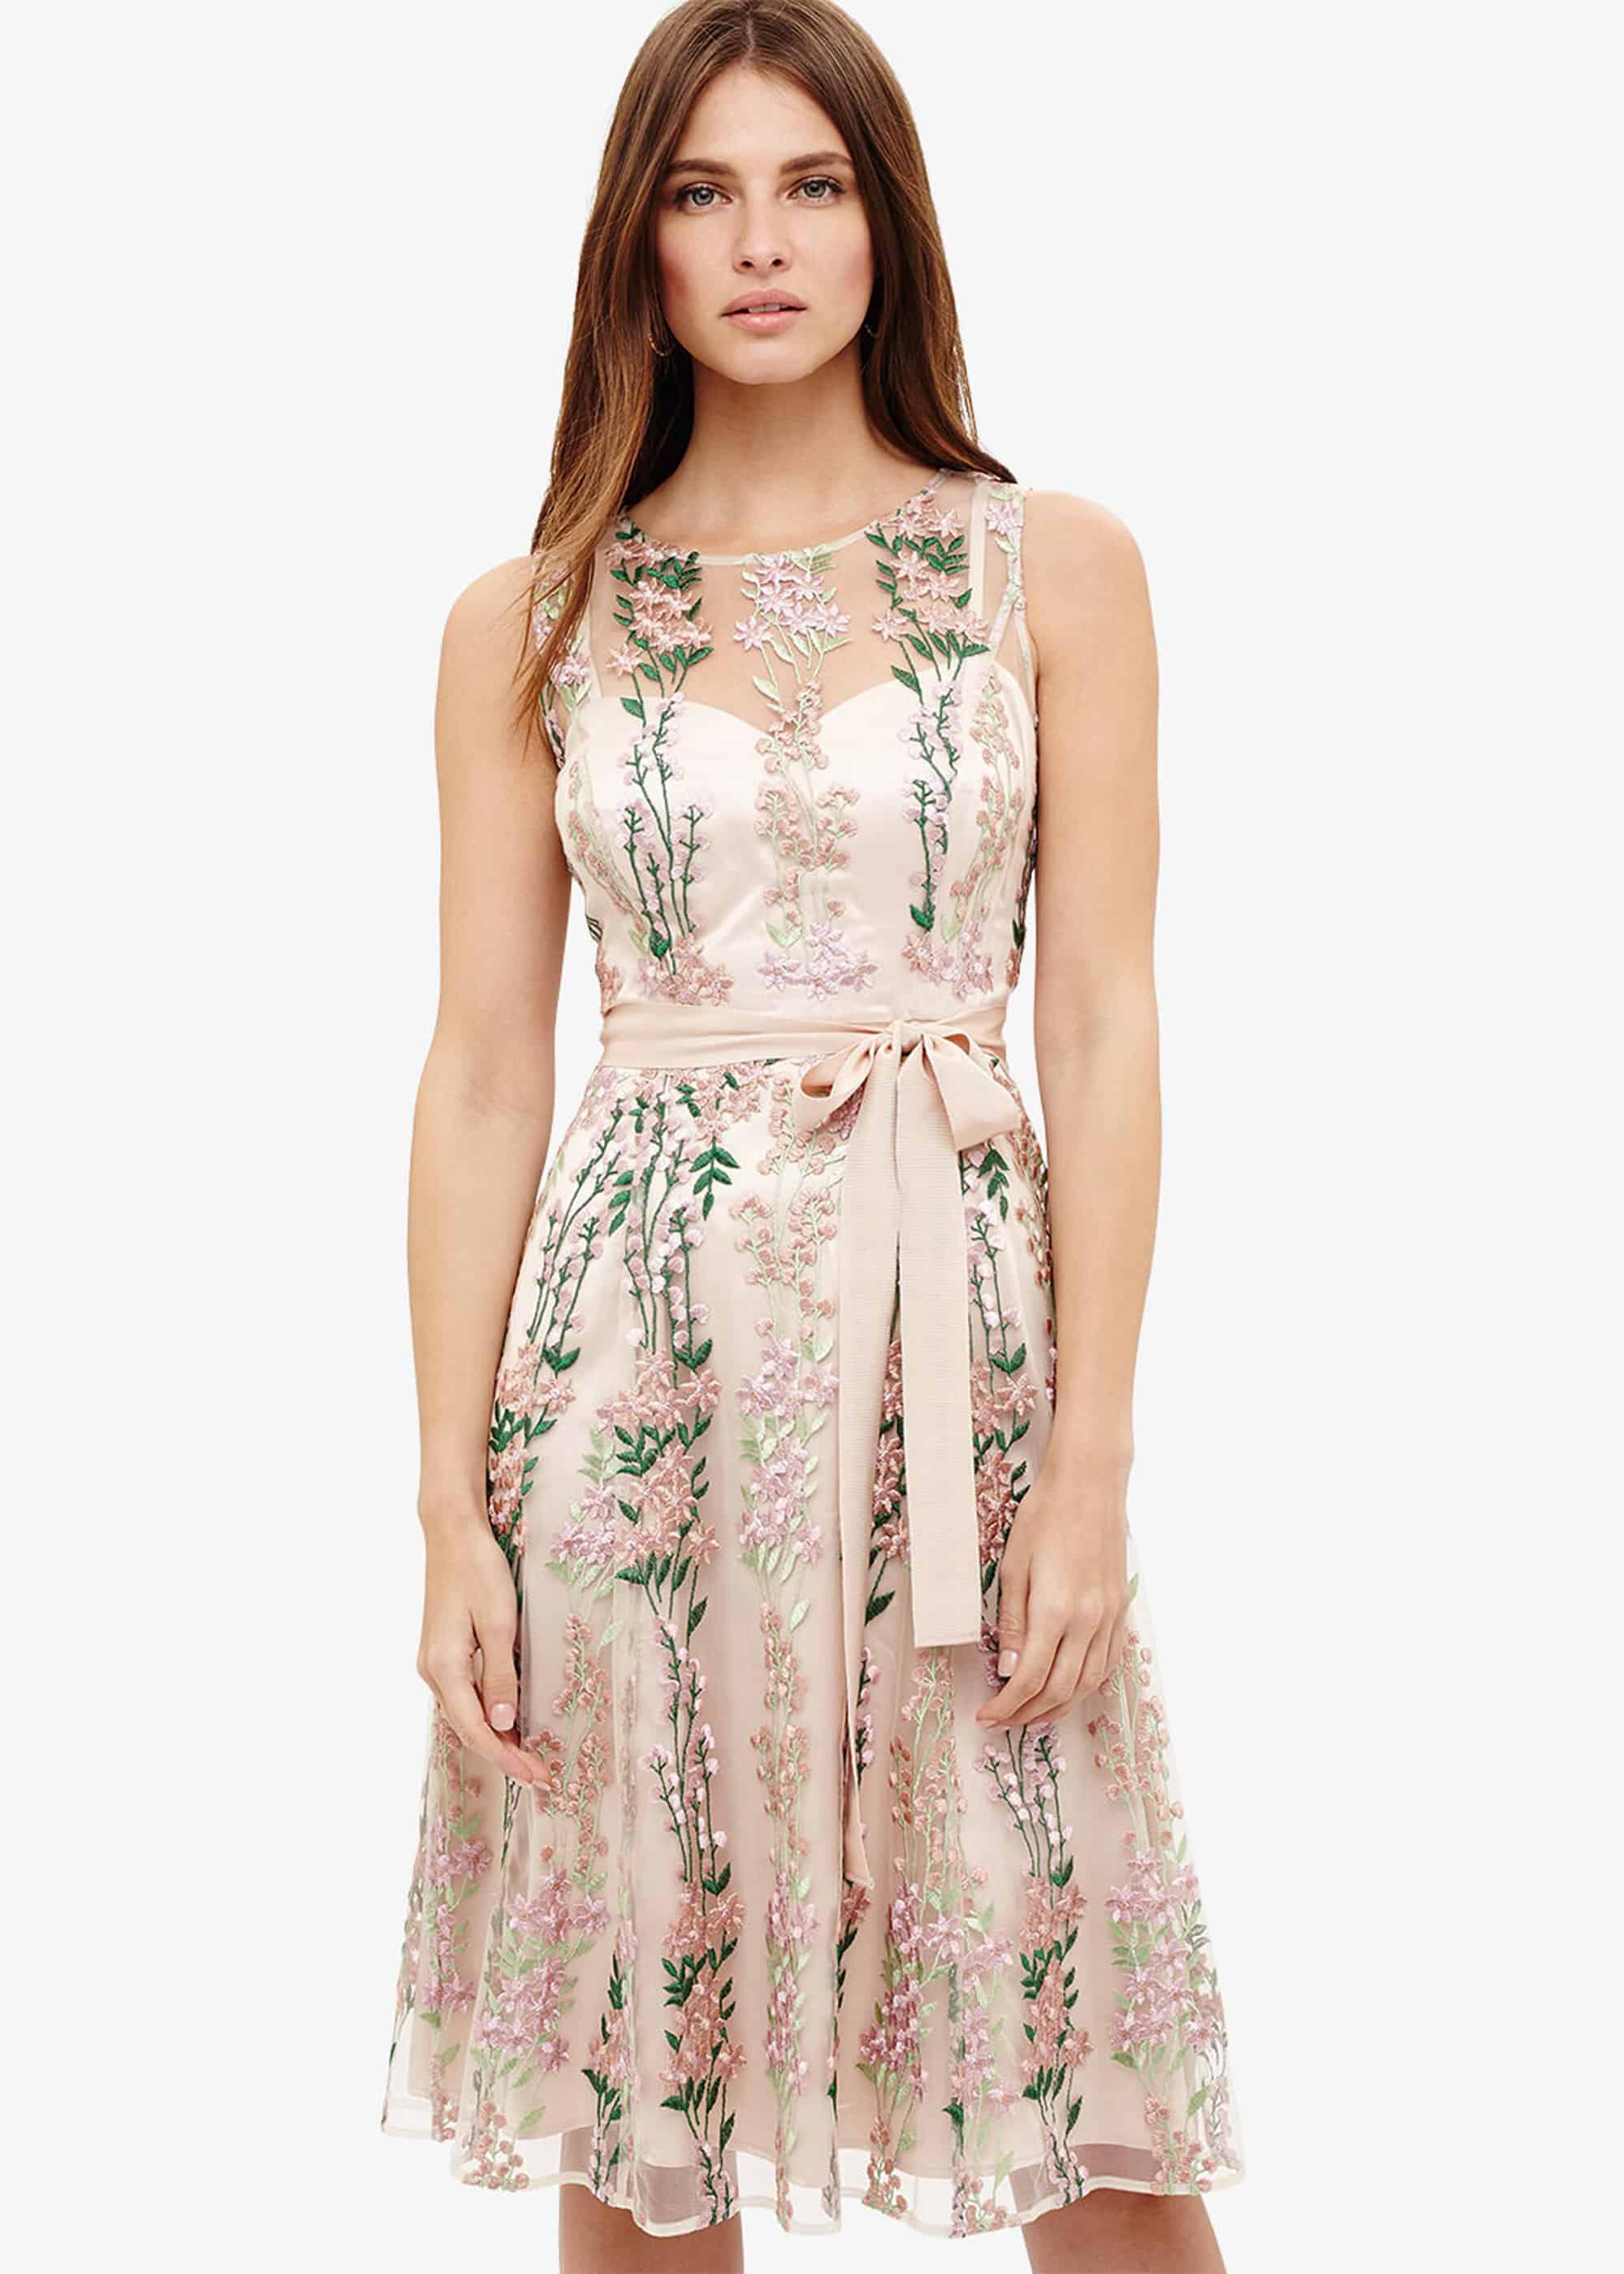 SCAM 32 Women Designer Inspired Embroidery dress